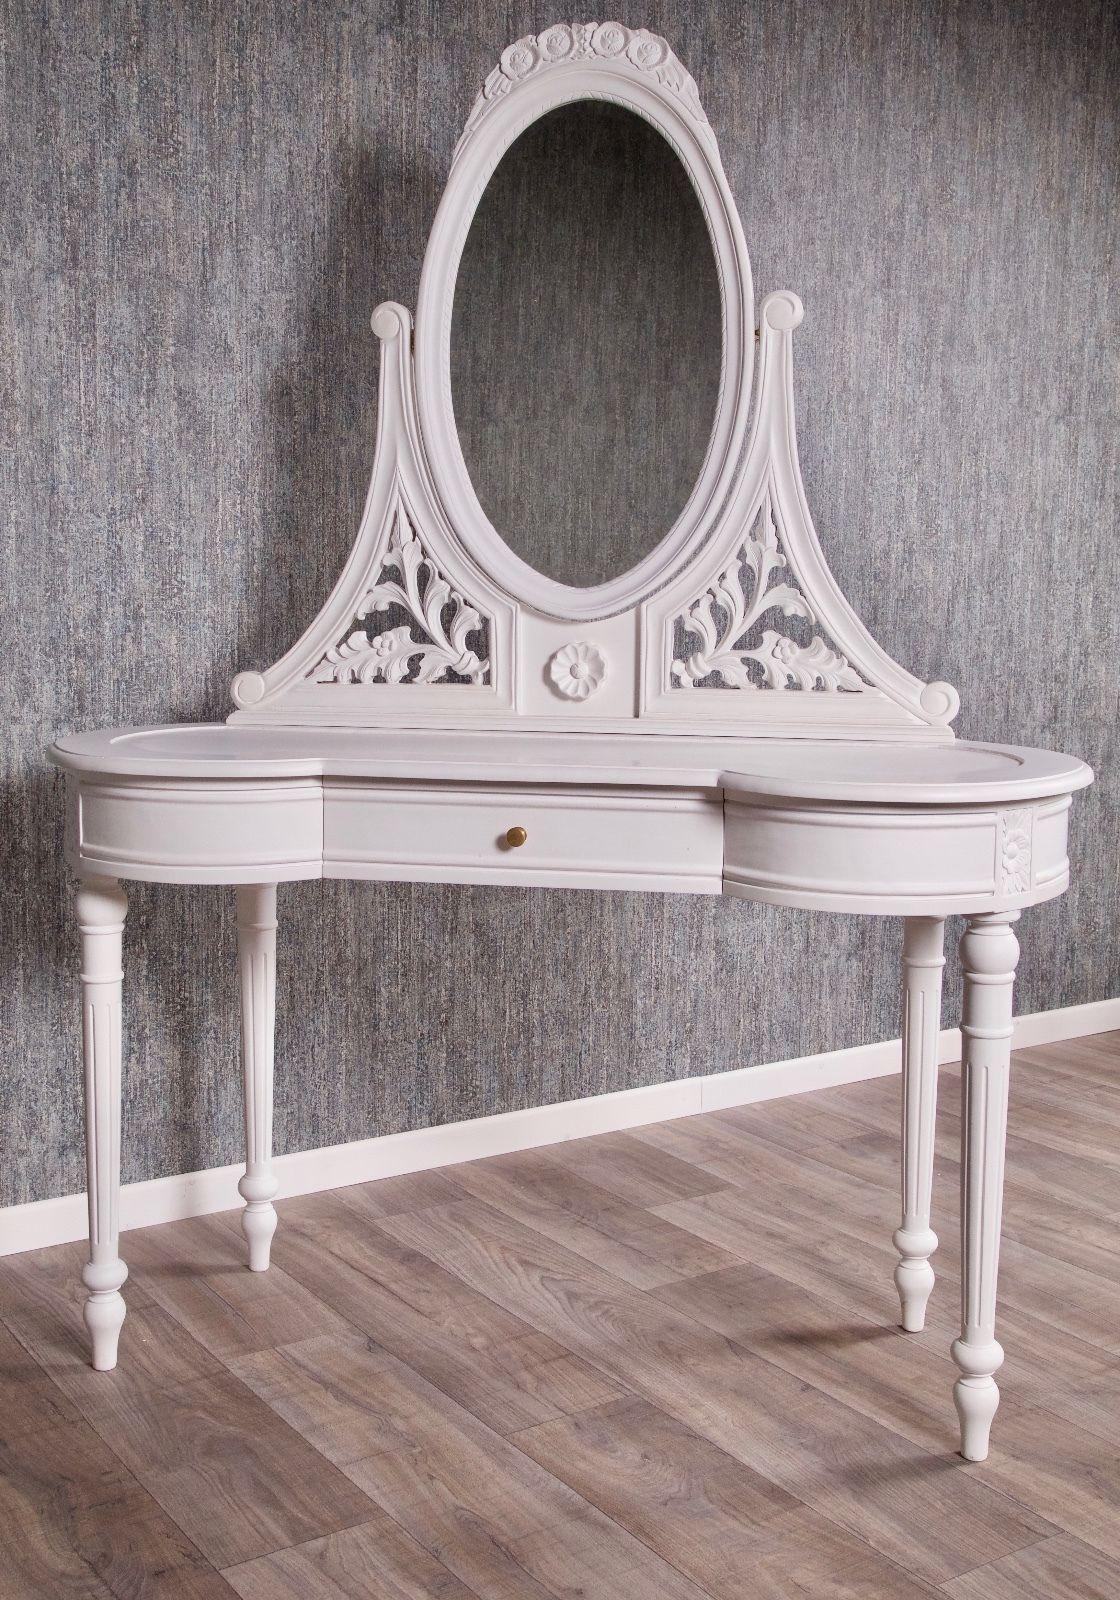 Barock Schminktisch Weiss Antik Massiv Stil Spiegel Art